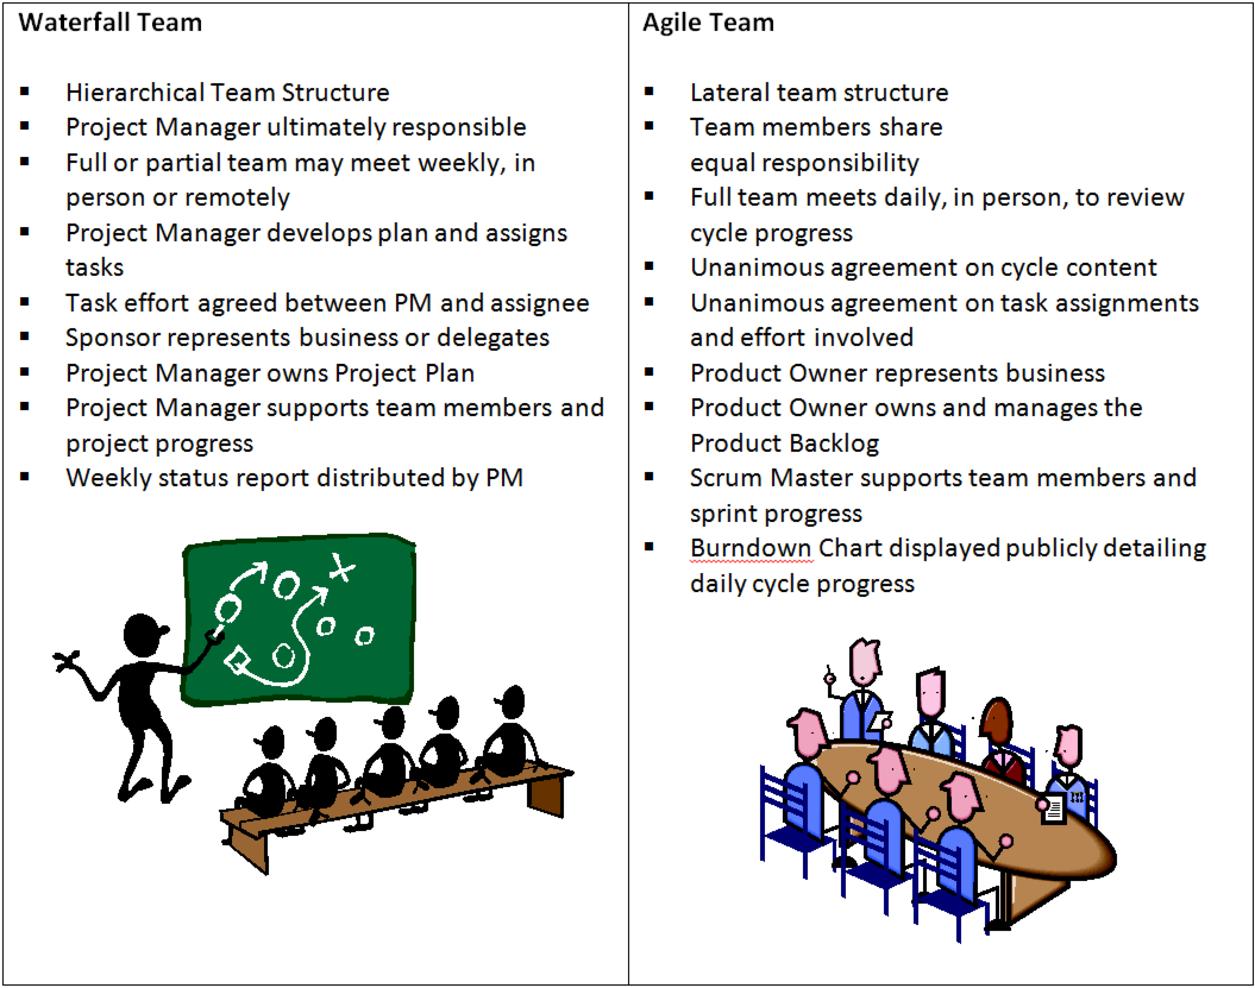 Agile Basics back to basics series: waterfall team vs. agile team | how